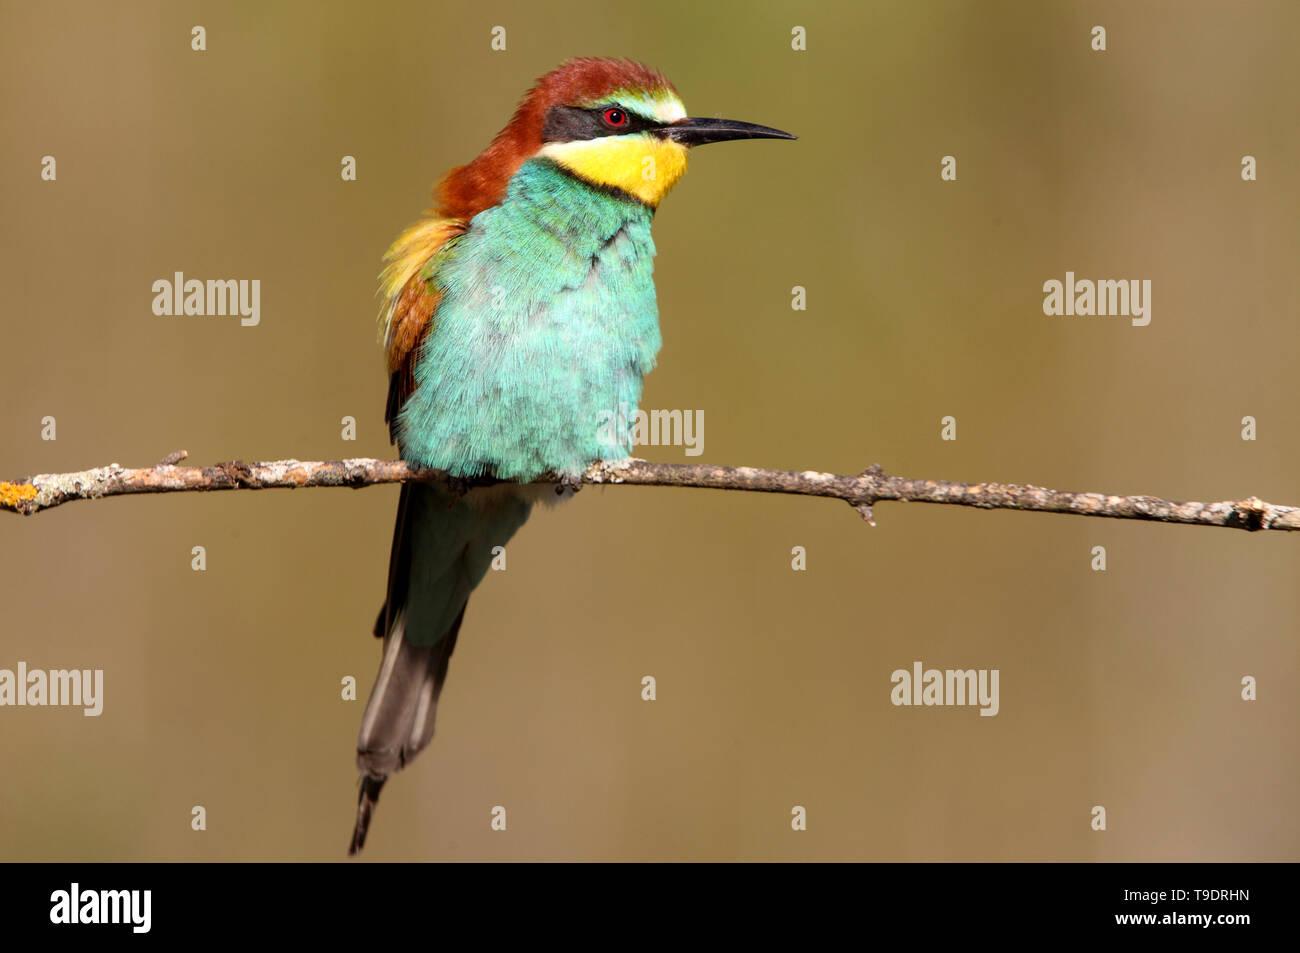 Merops apiaster Stock Photo